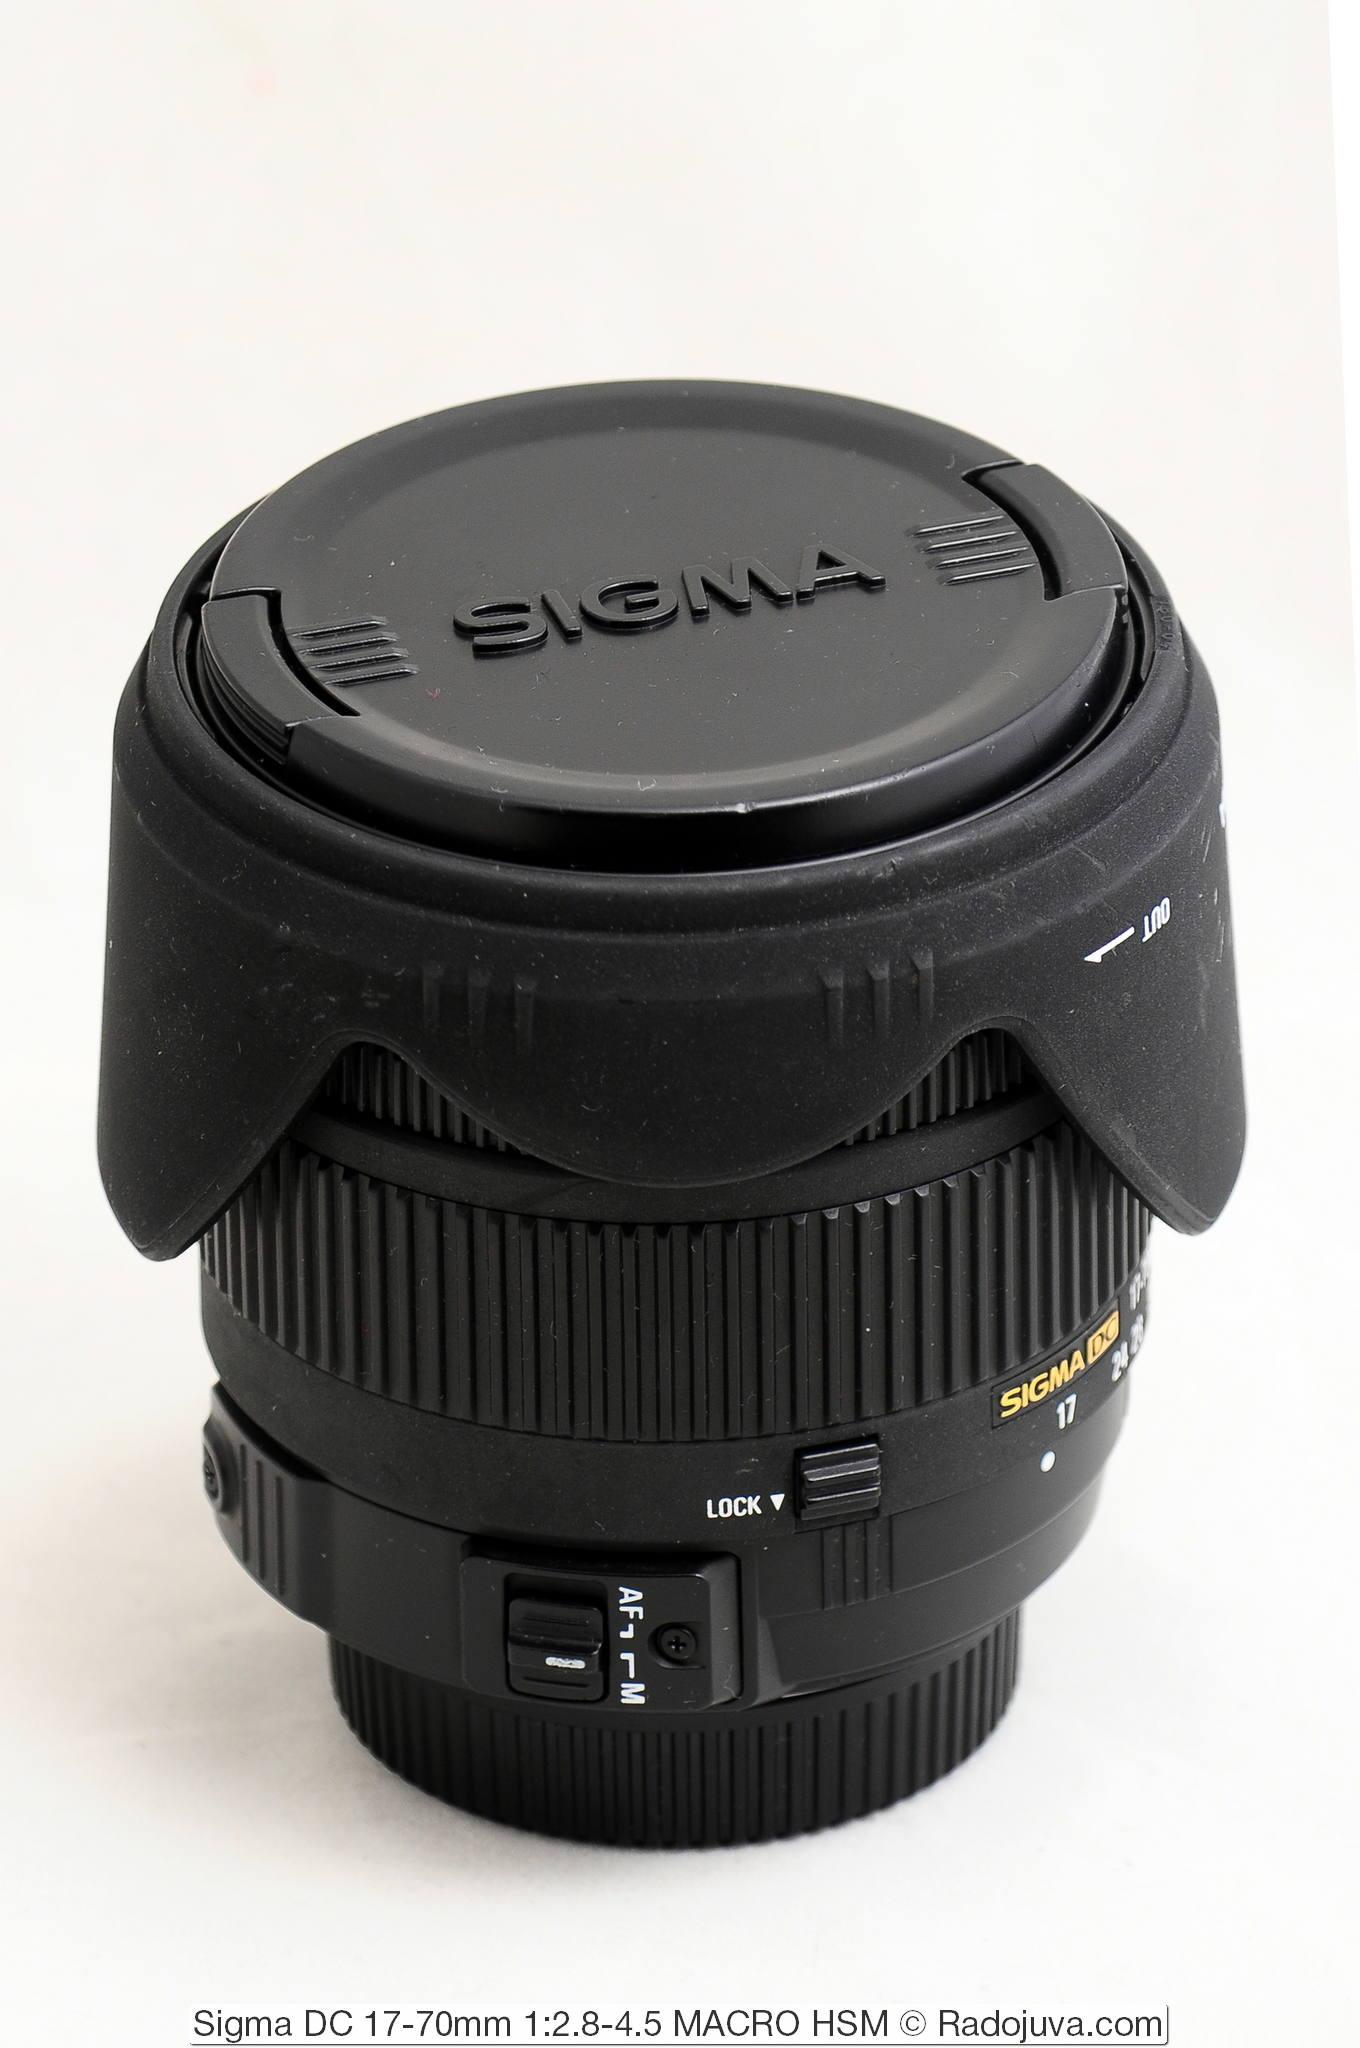 Sigma 17-70/2.8-4.5 Macro HSM